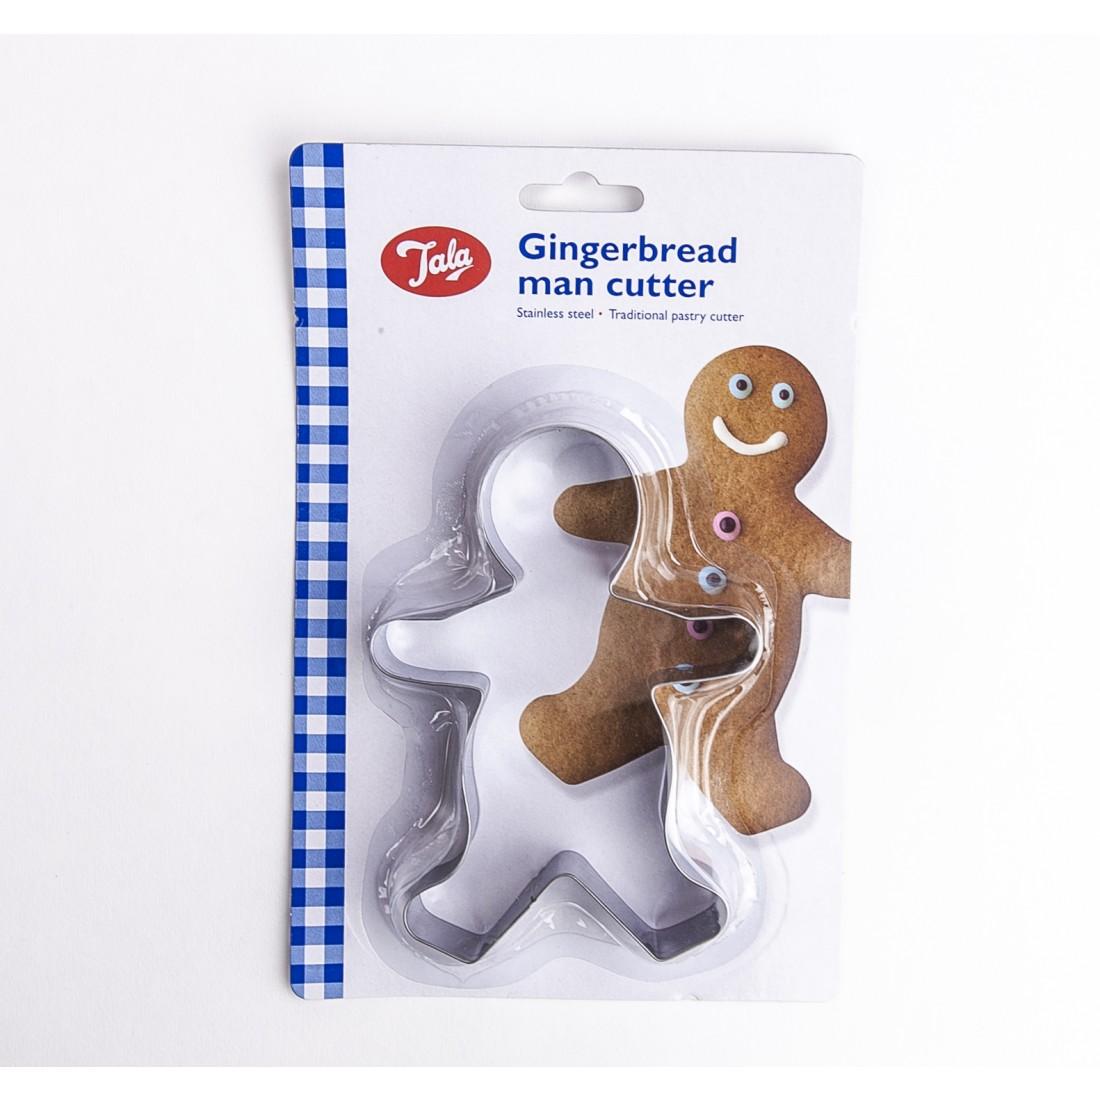 Tala Gingerbread Man Cutter Fondant Sugarcraft Cake Decoration